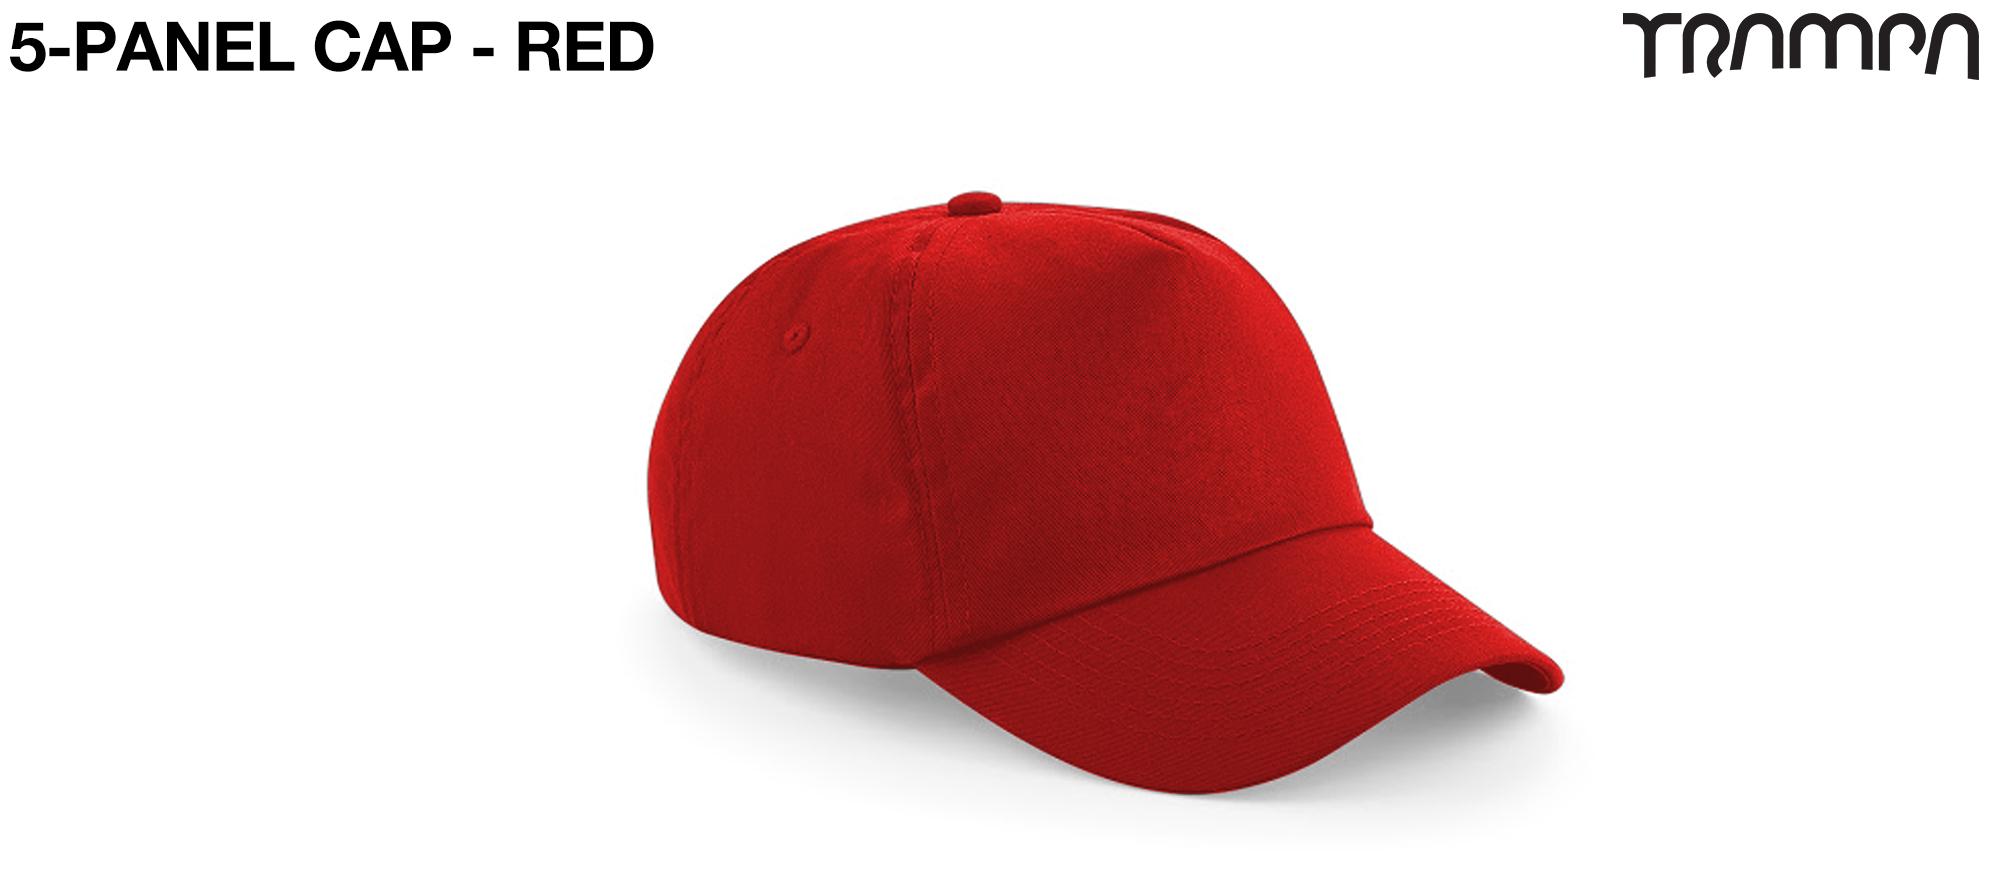 5 Panel HEAVY BASEBALL Cap - RED